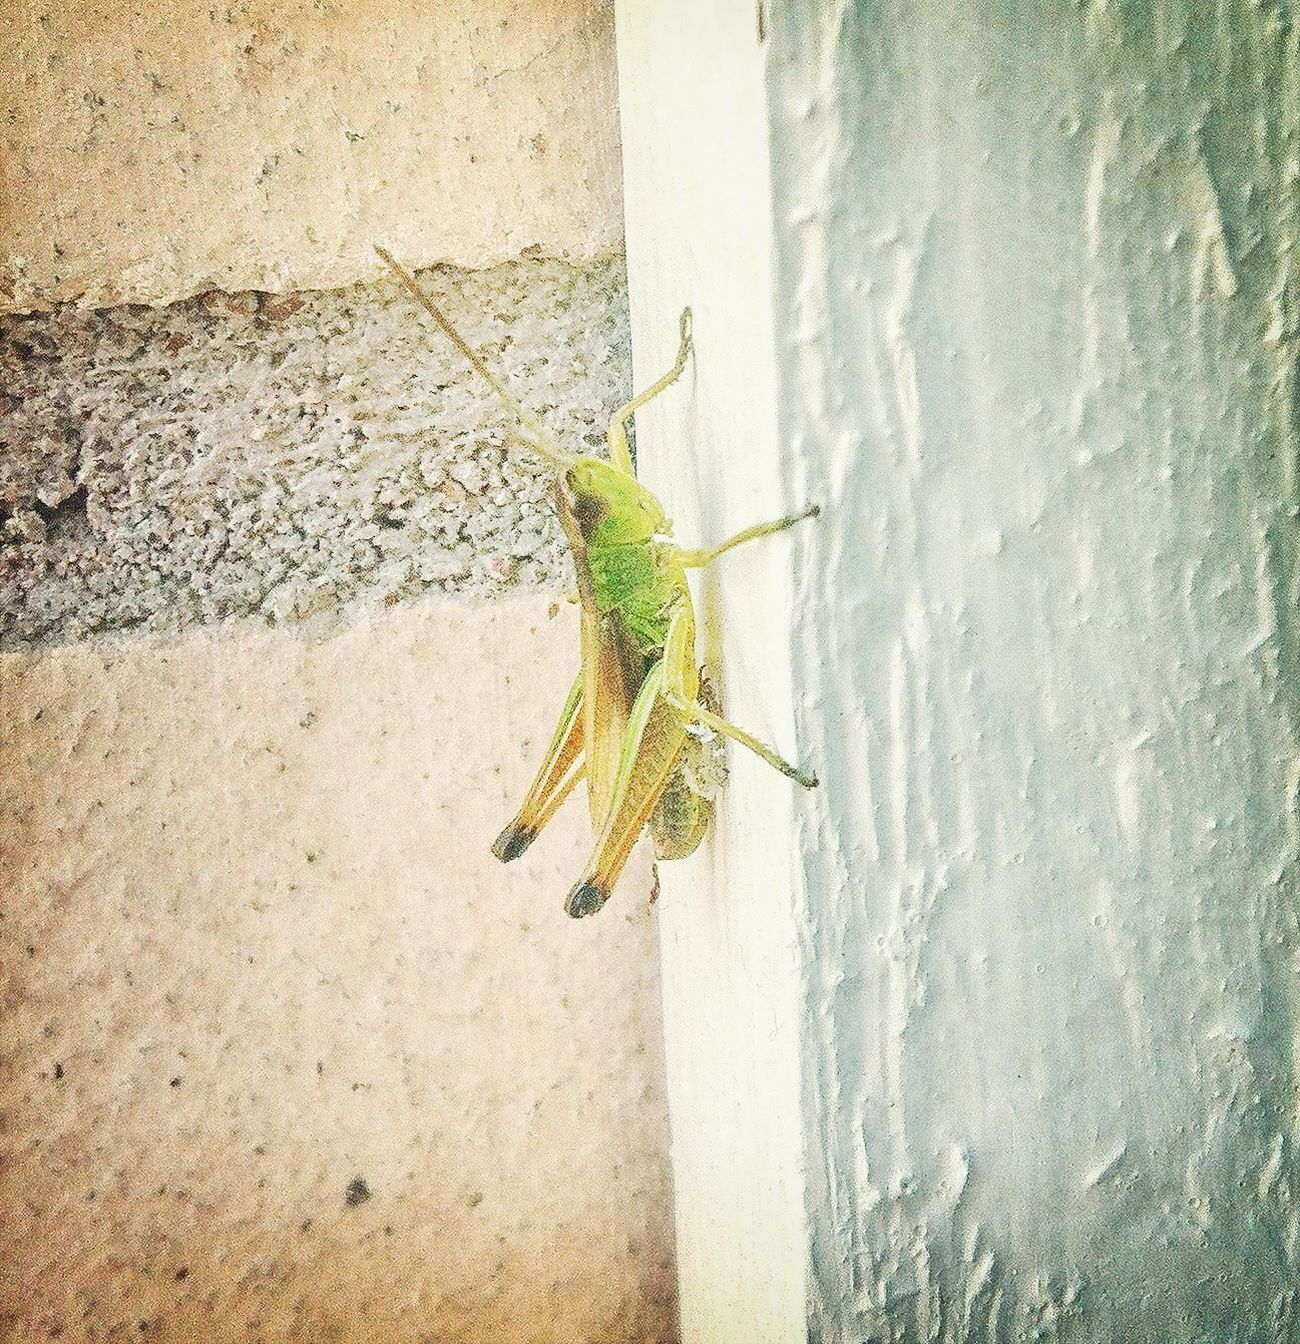 Grasshopper Cheese! Summer YOLO ✌